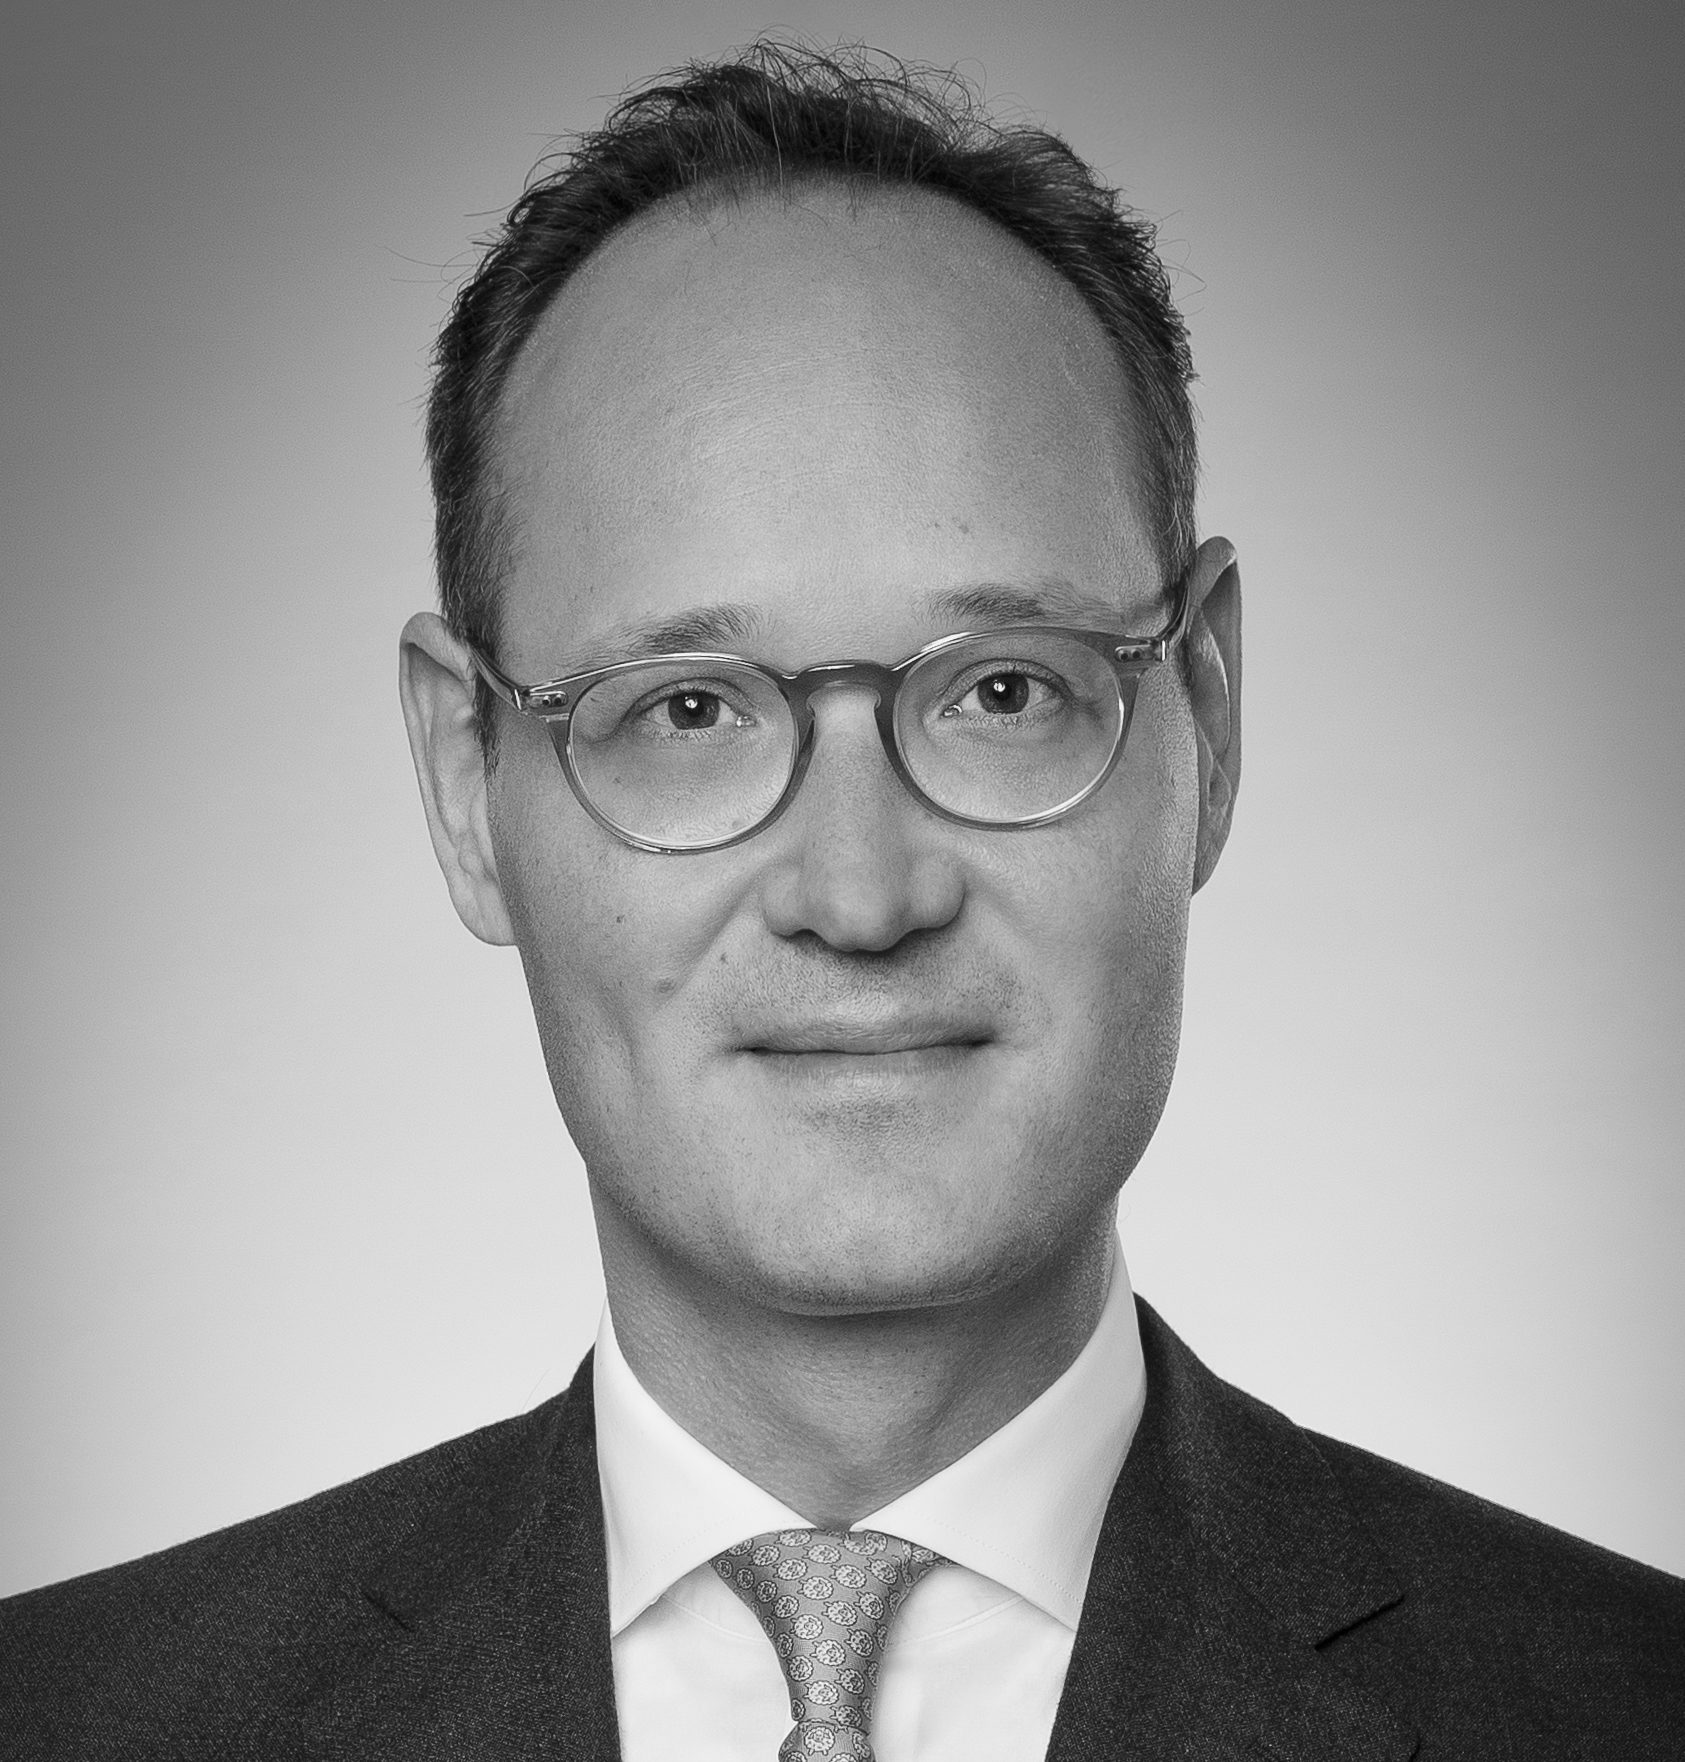 Bankhaus Lampe: Private Markets während Covid-19 – Einfluss auf Venture Capital & Private Equity